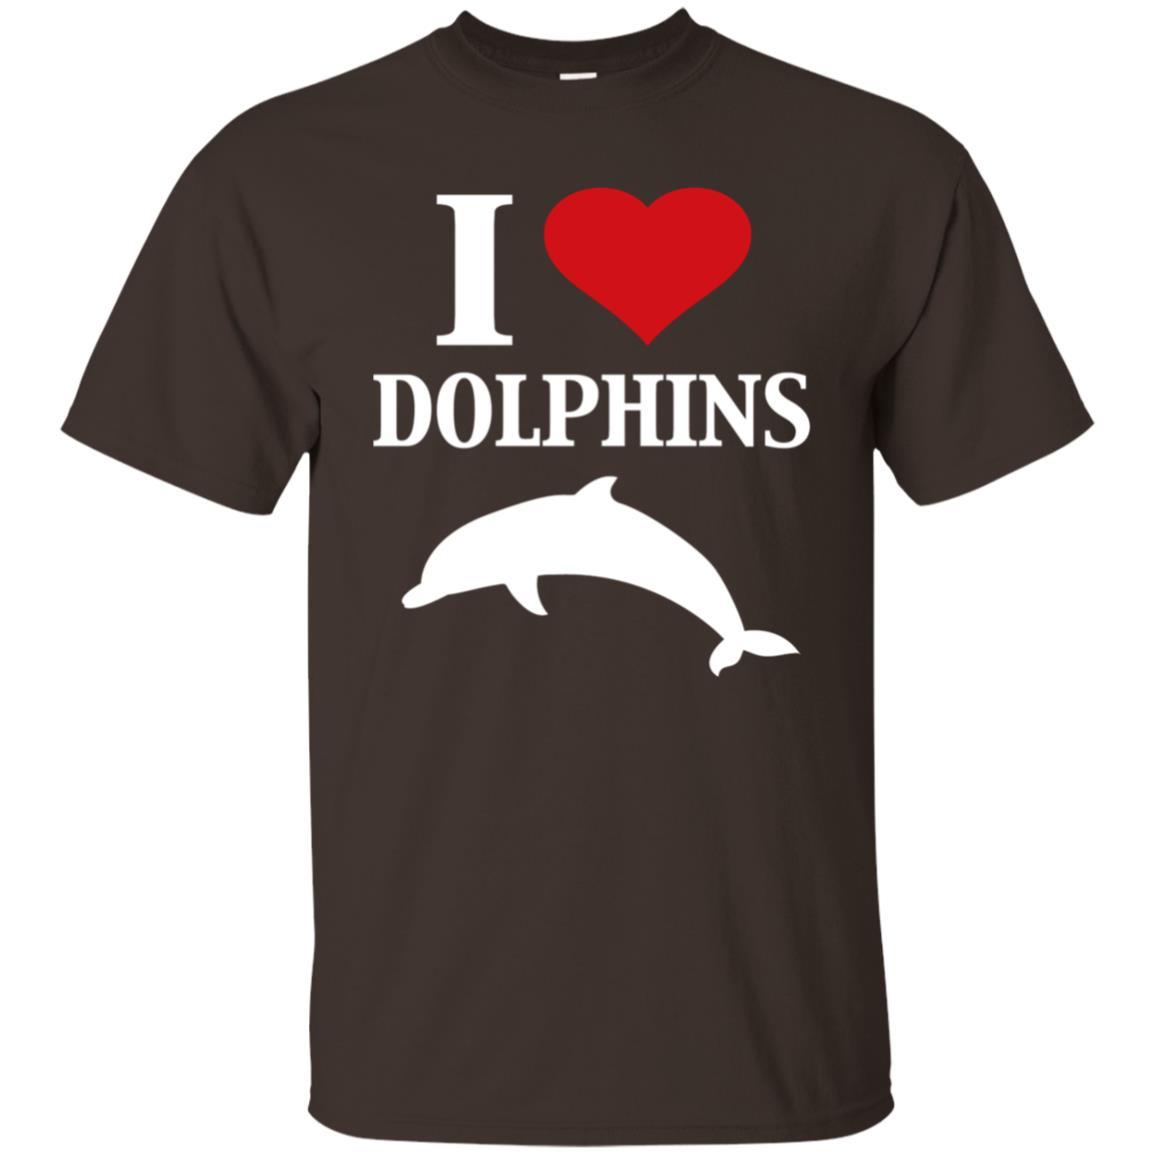 I Heart Love Dolphins Cute Graphic Ocean Animal Unisex Short Sleeve